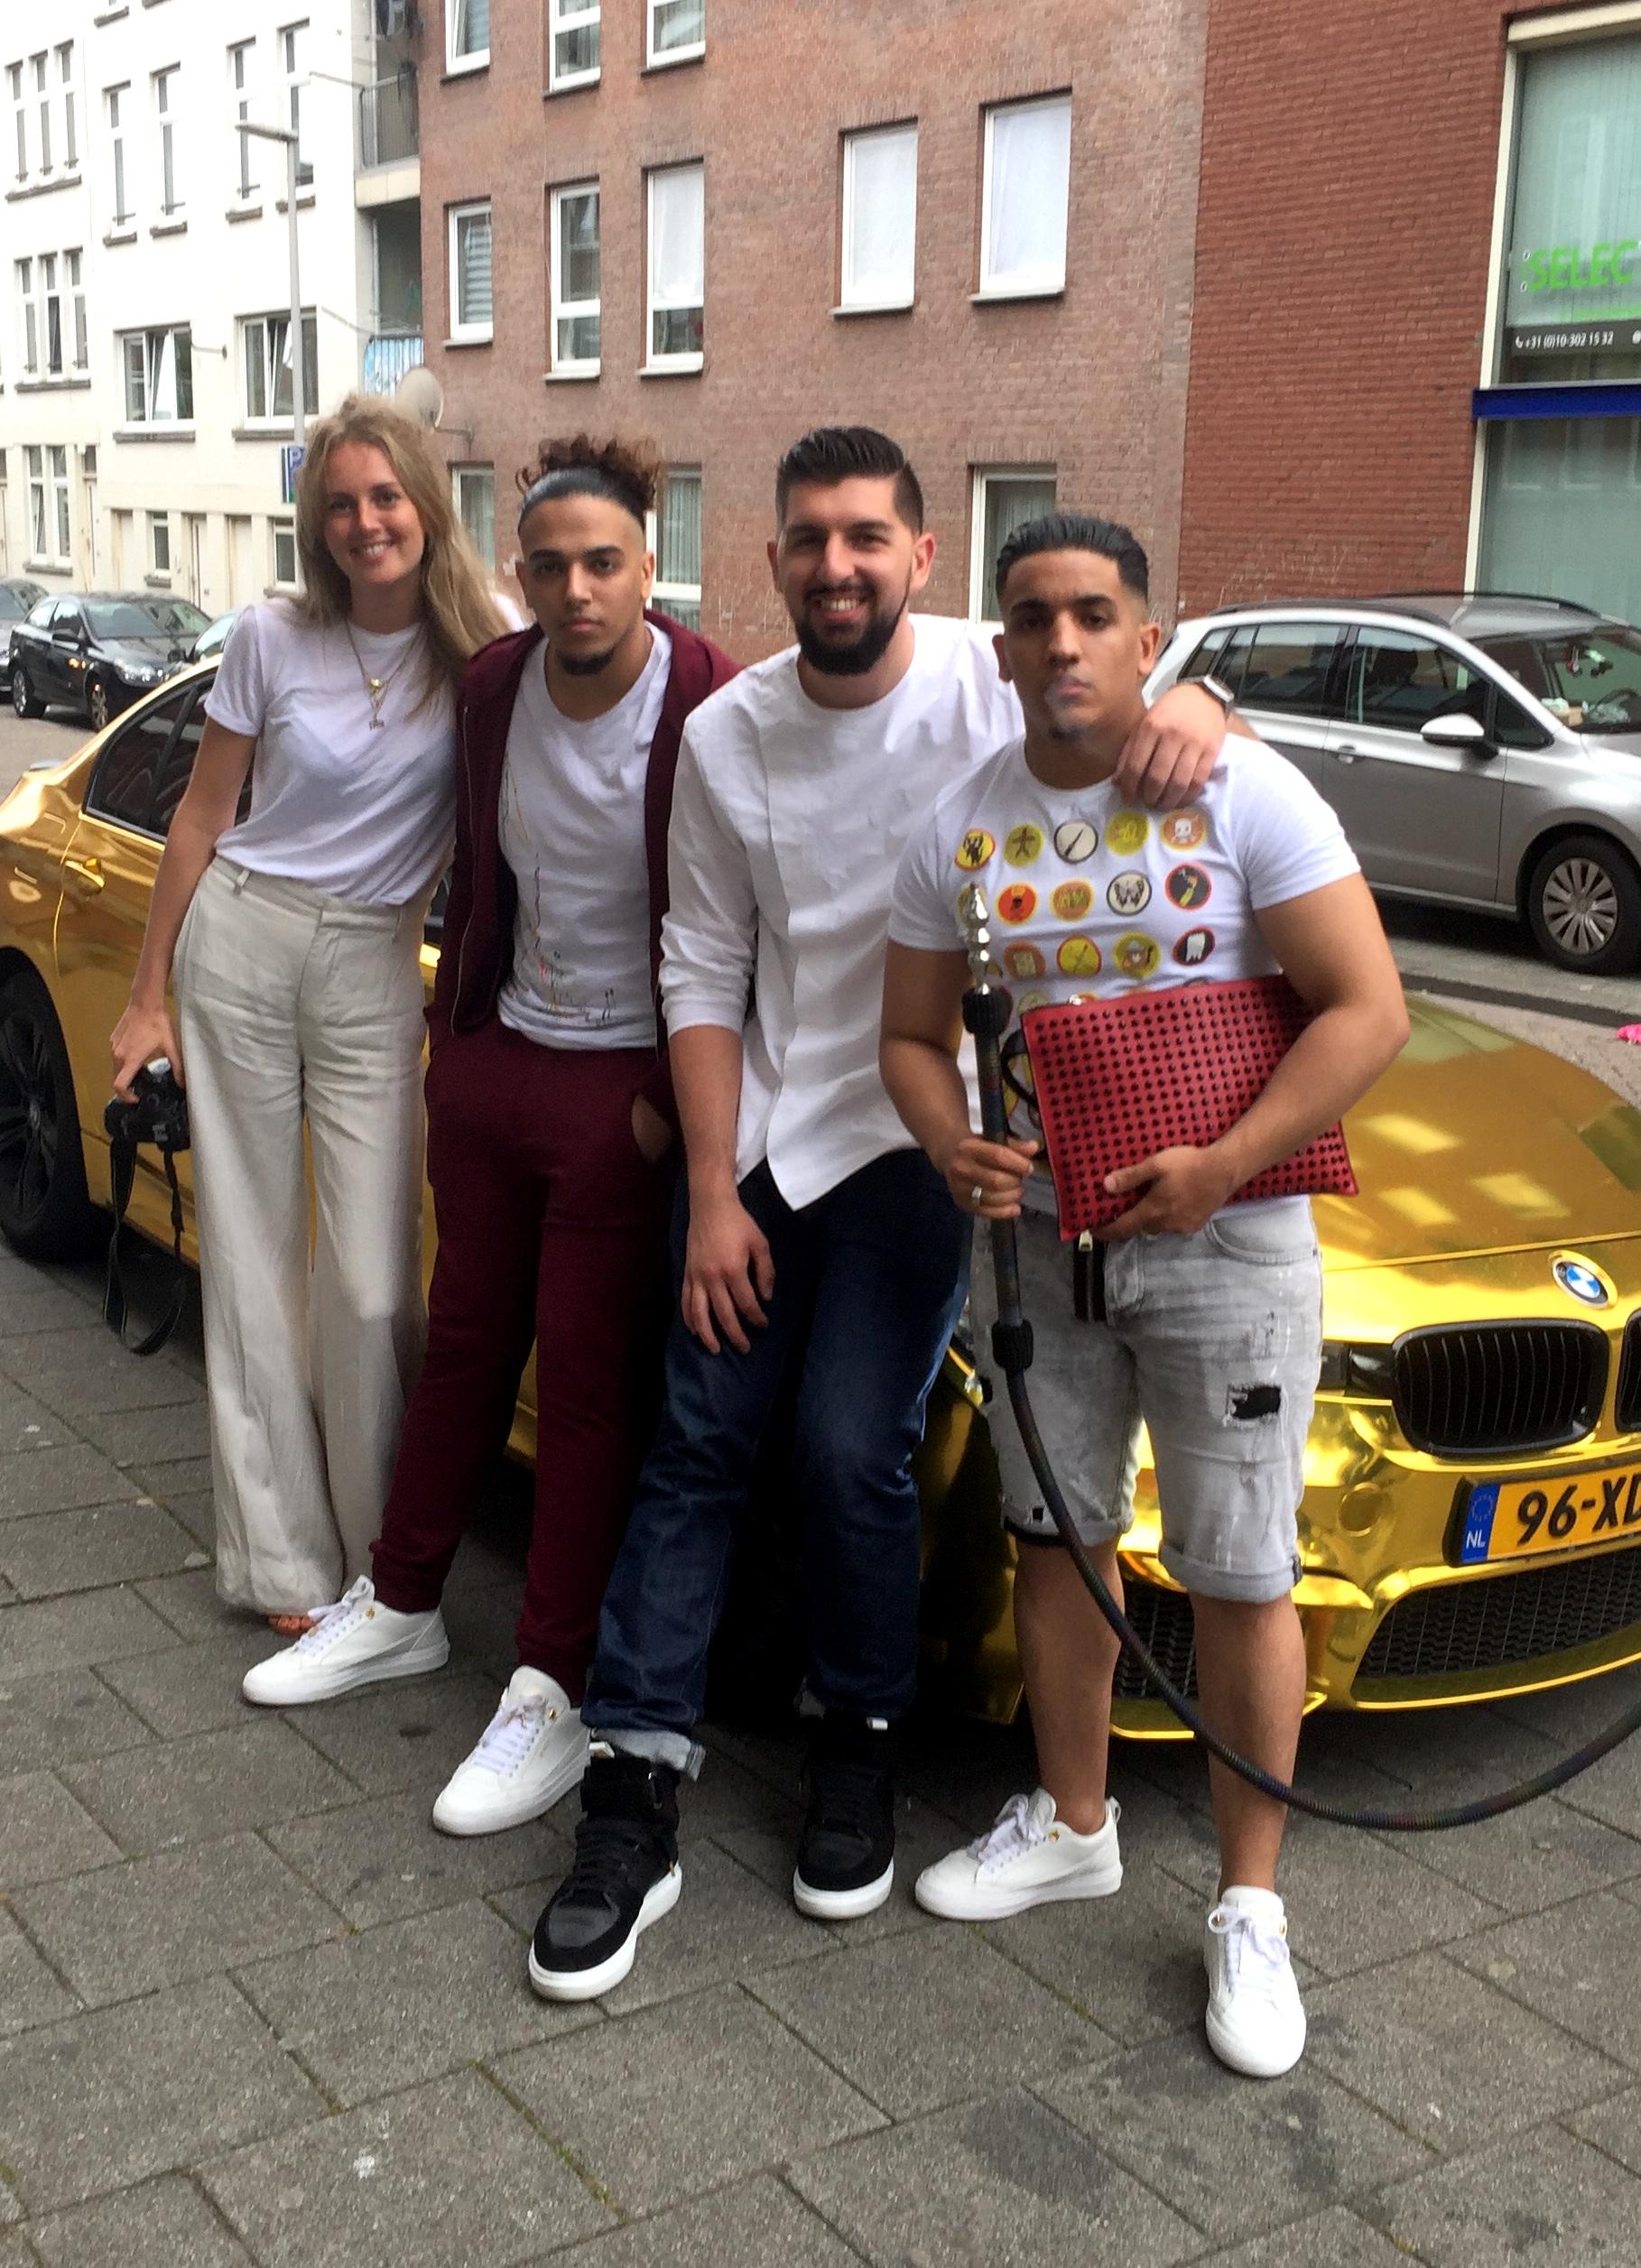 mocromode marrokaans-nederlands